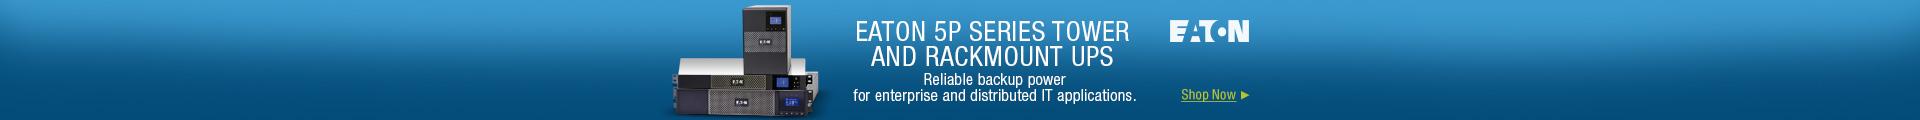 EATON 5P SERIES TOWER AND RACKMOUNT UPS